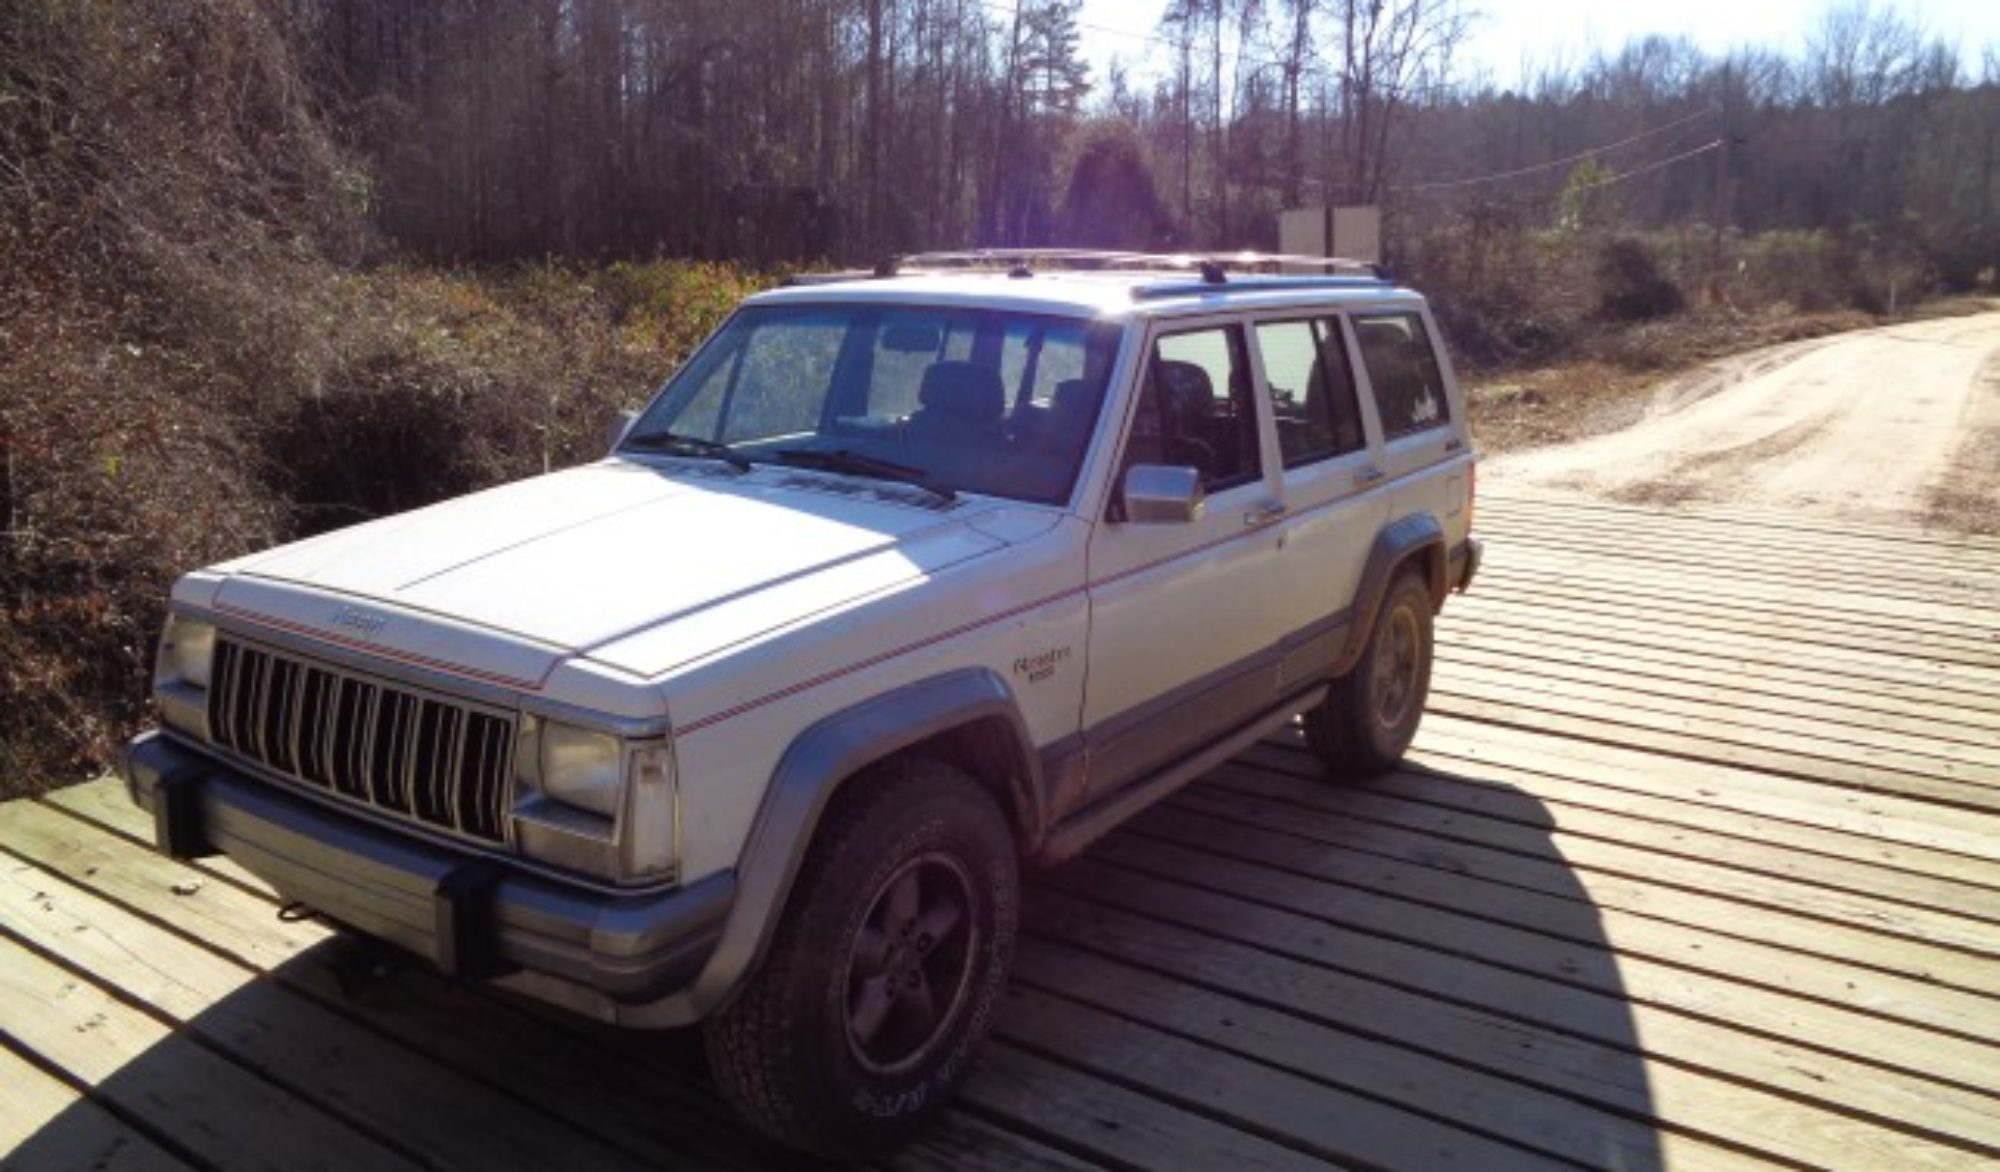 Aw4 Troubleshooting The Jeep Guru 1998 Cherokee Transmission Wiring Plug Performance Improvement Ideas